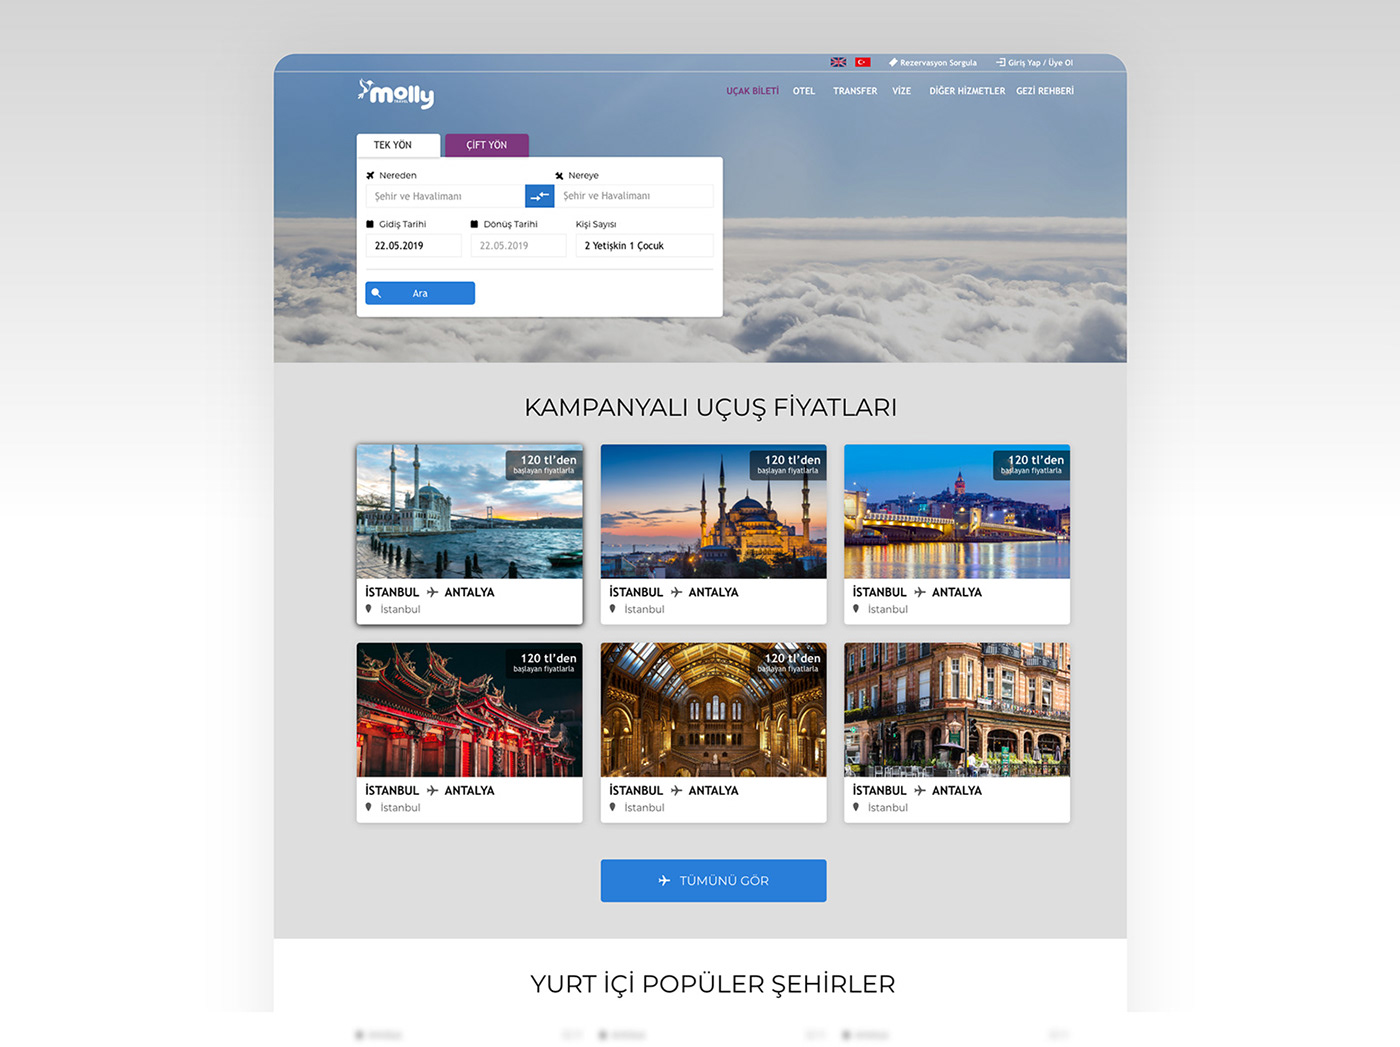 design,UI,user experience,user interface,ux,Web,Web Design